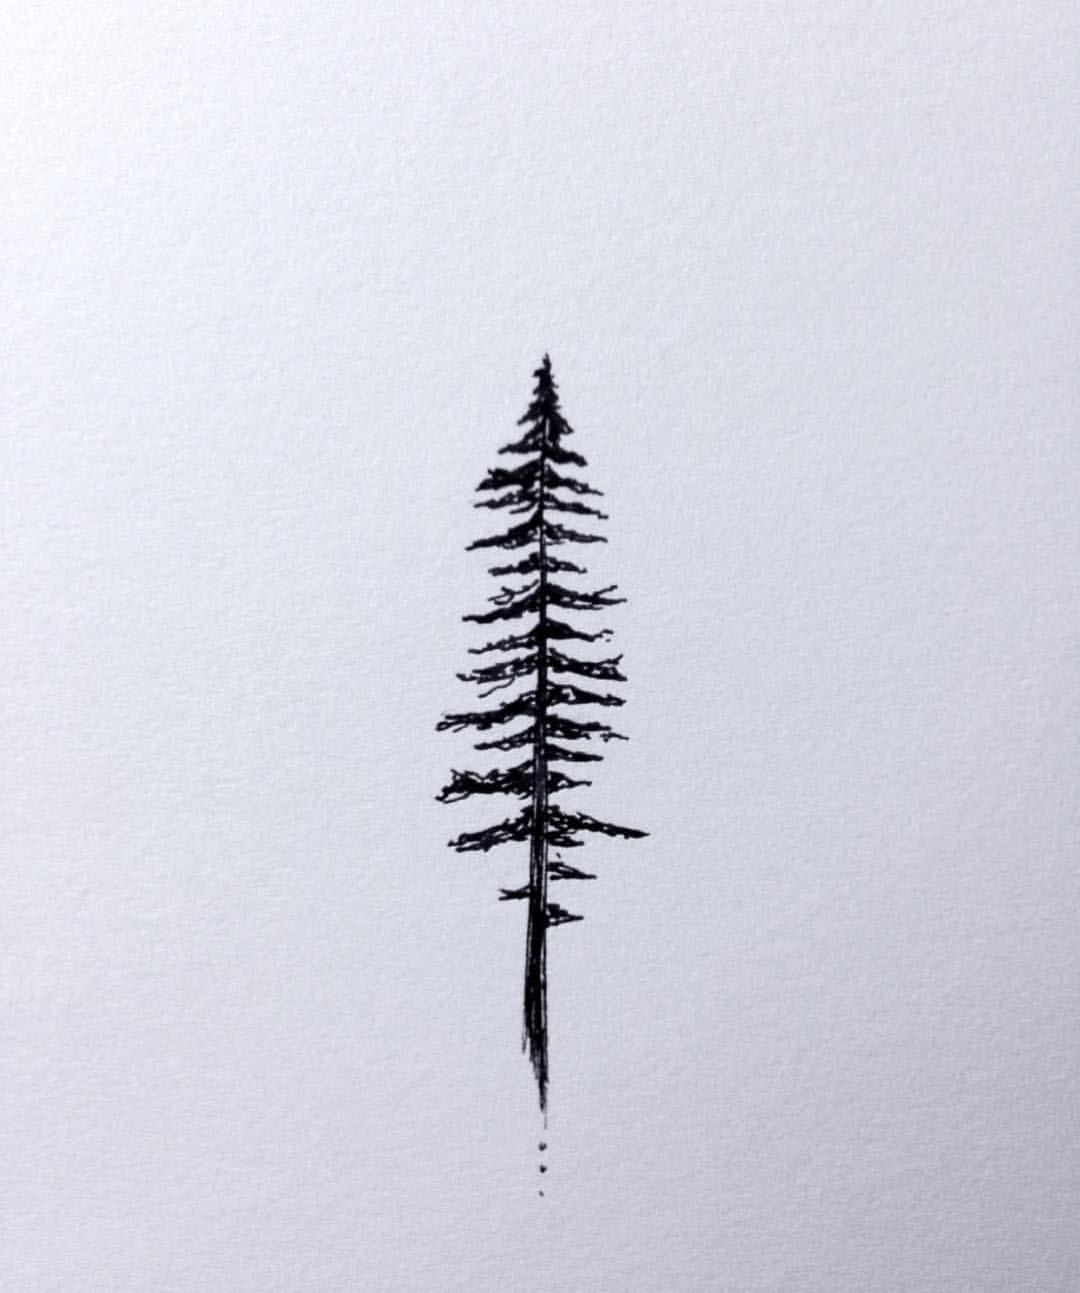 "Pnwonderland on Instagram: ""Creative inspiration 🖋 Artwork by @chasingamoment #pnwonderland"""